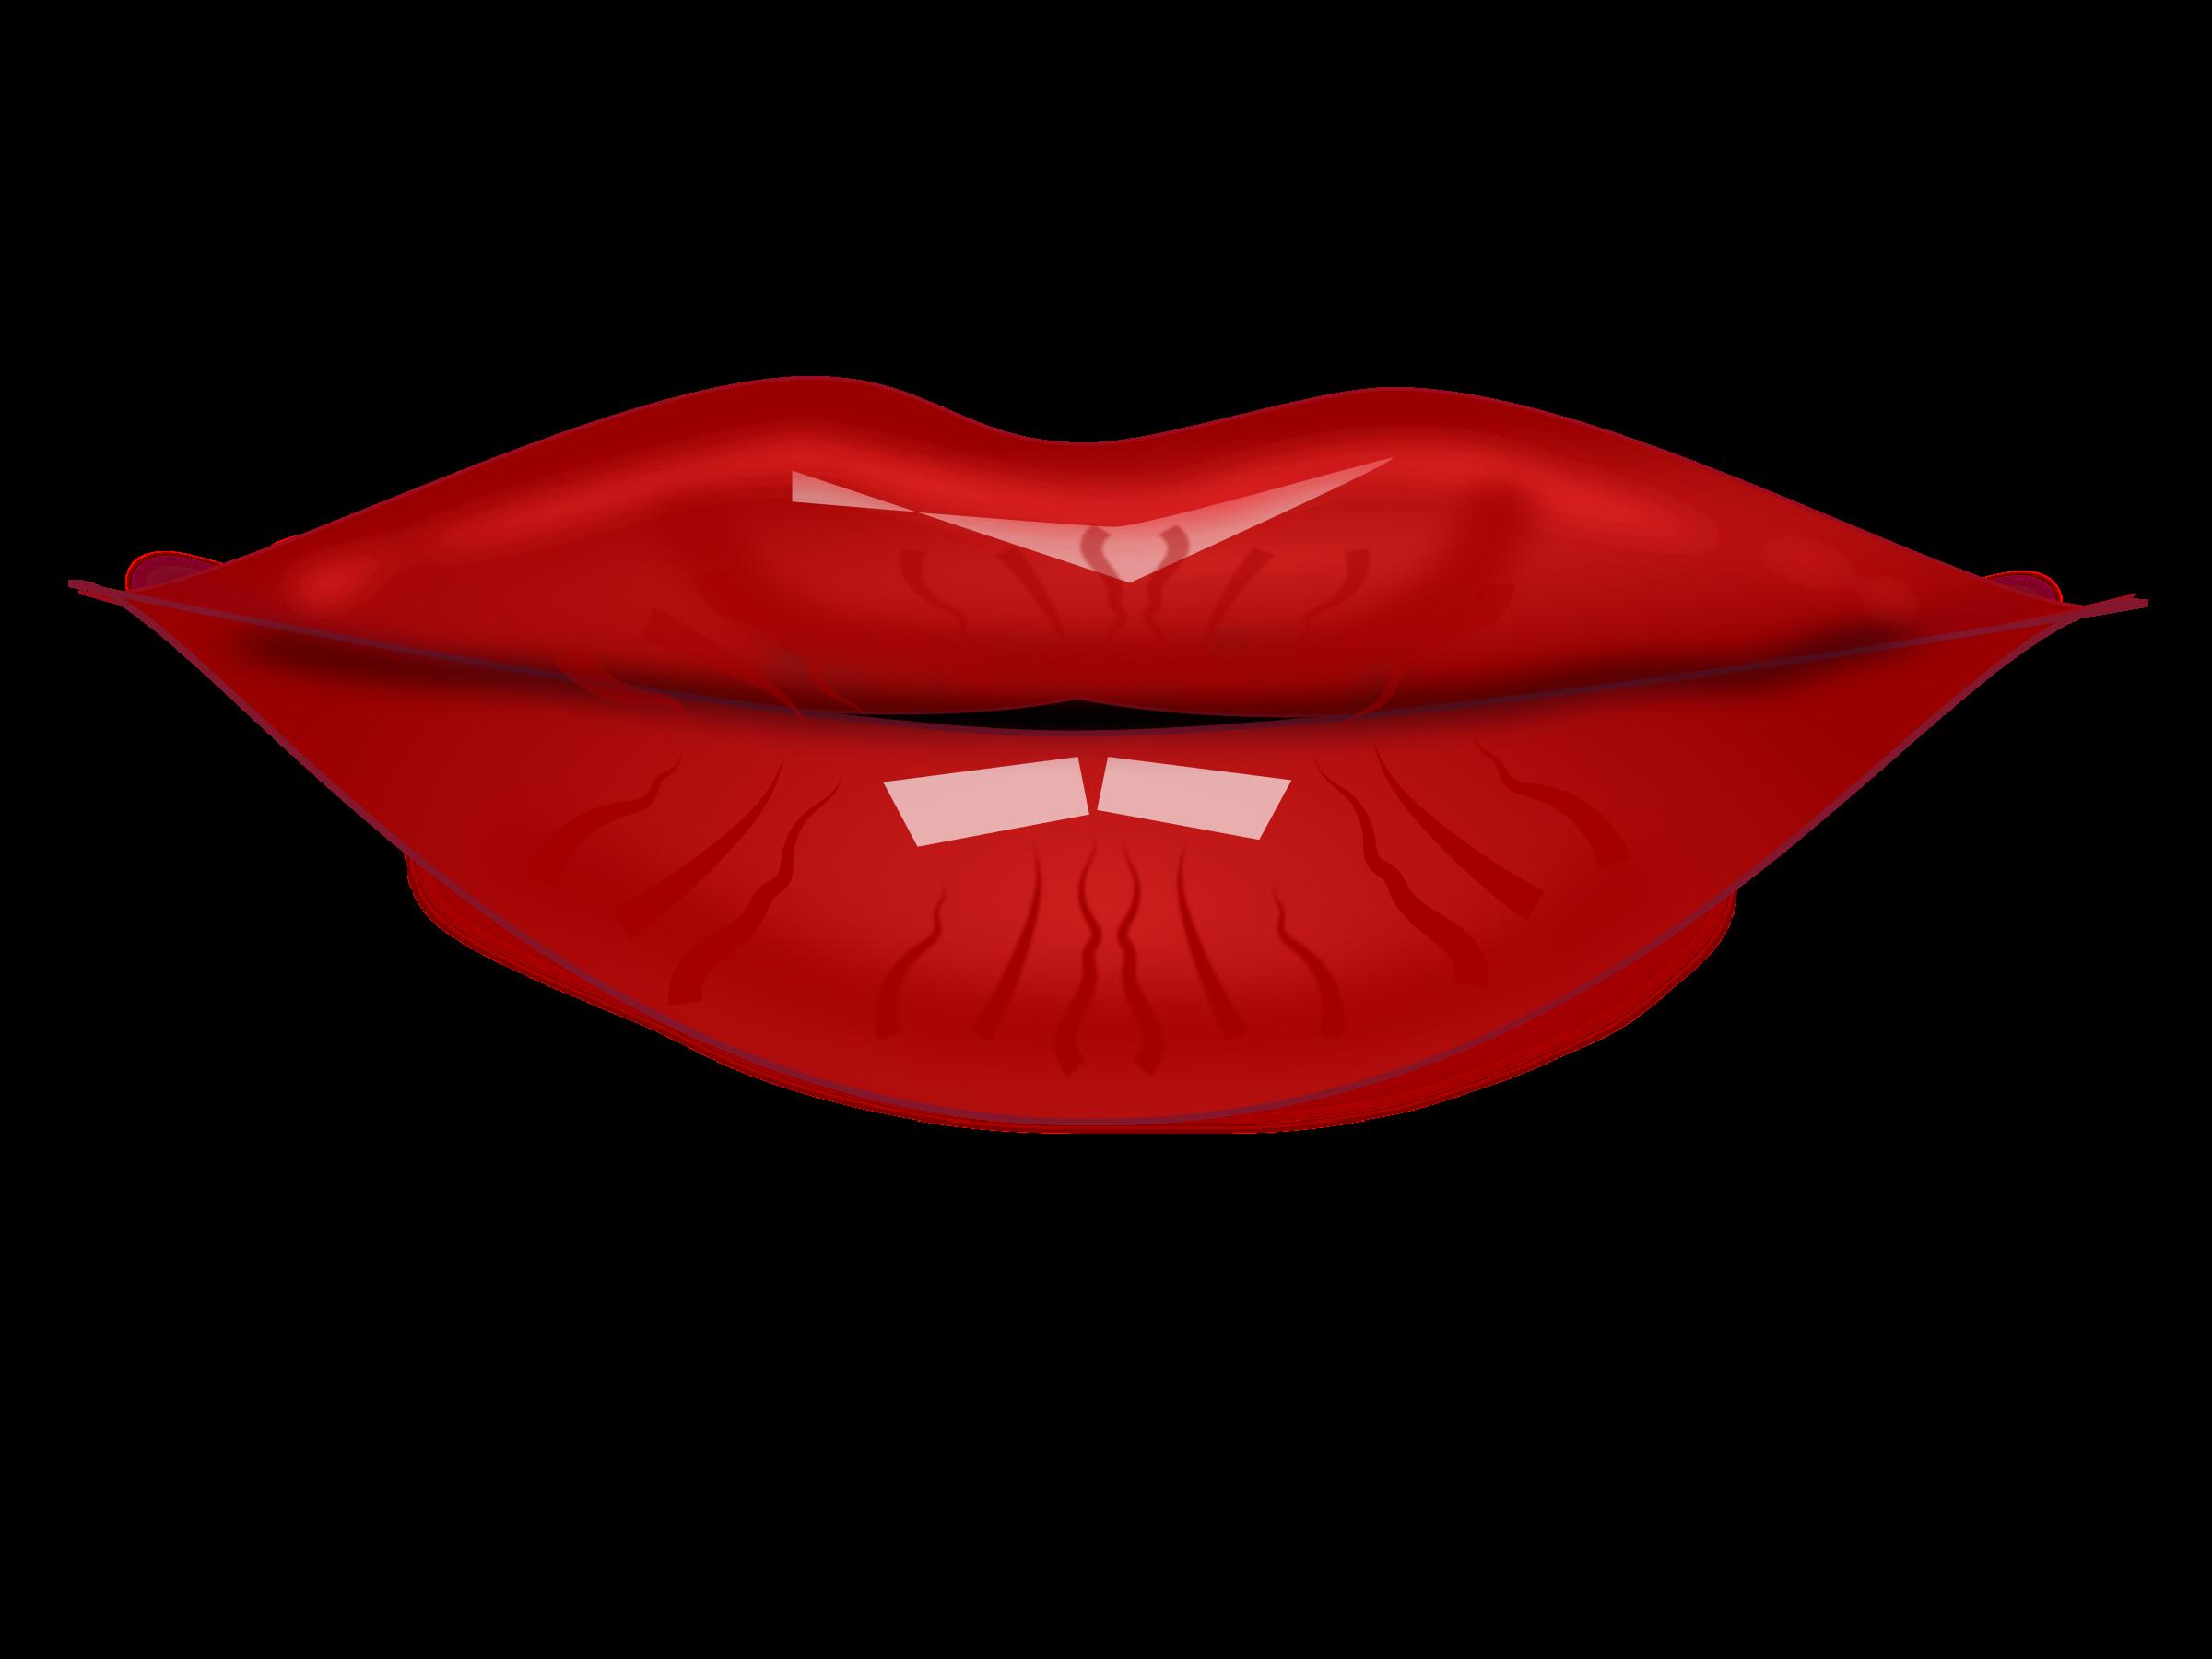 Clipart lips by netalloy